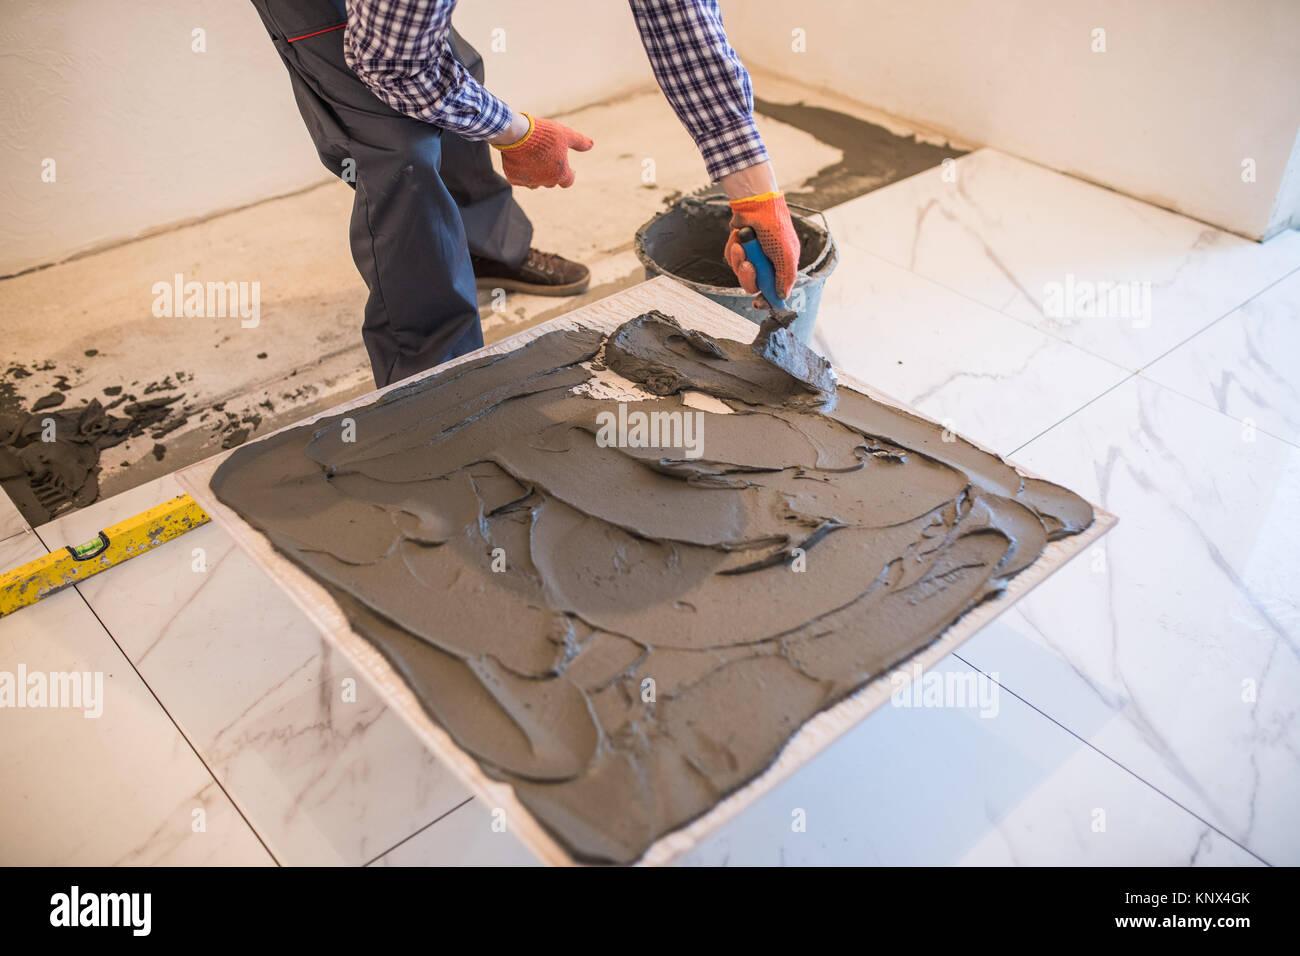 Cute 1 Inch Hexagon Floor Tiles Tiny 12 X 24 Ceramic Tile Round 12X12 Ceiling Tiles Home Depot 1930S Floor Tiles Youthful 2 X 6 Subway Tile Backsplash White3X6 Travertine Subway Tile Man Hand Troweling Adhesive For Ceramic Tile Flooring Stock Photo ..